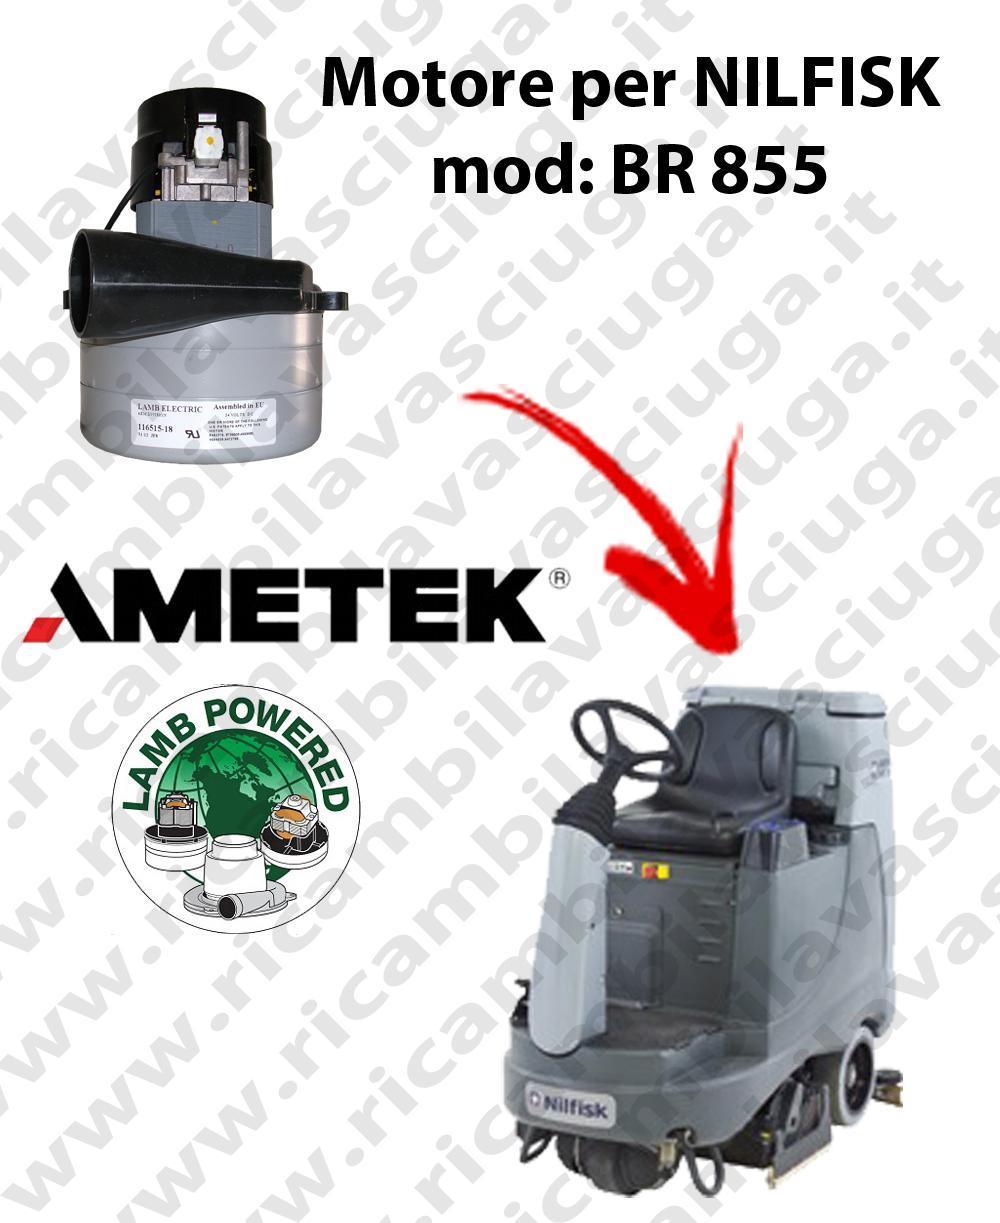 BR 855 Motore de aspiración LAMB AMETEK para fregadora NILFISK